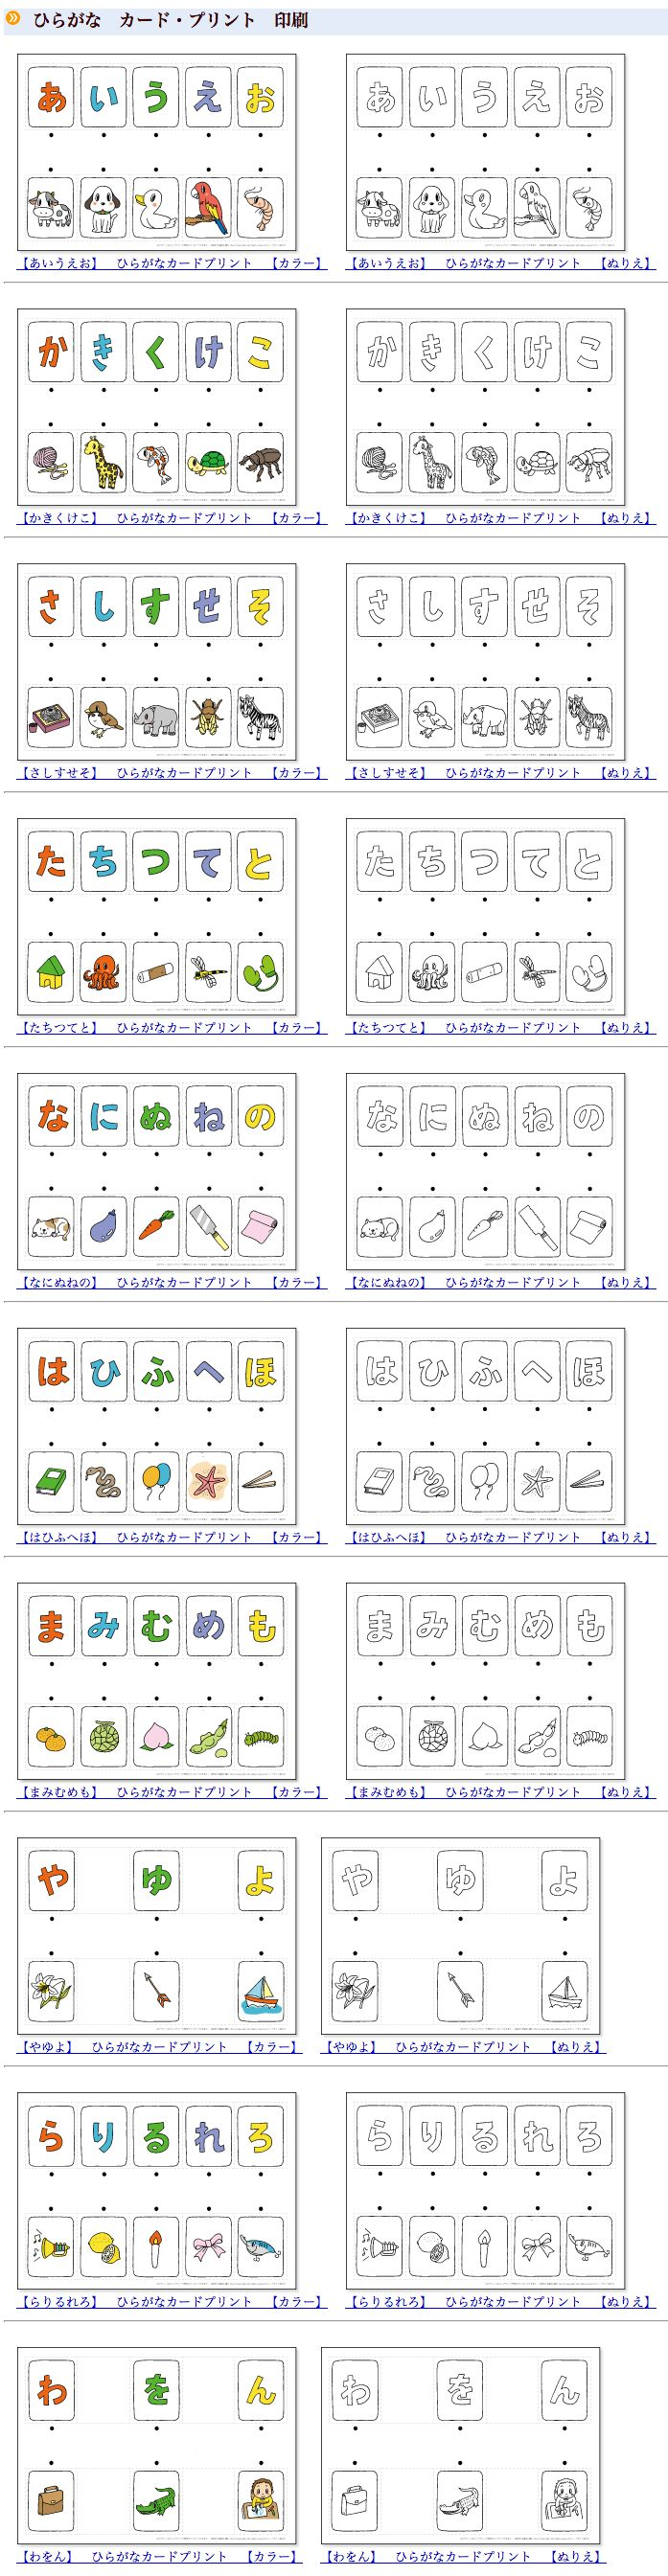 Workbooks japanese hiragana worksheets : 117 best Japanese Practice images on Pinterest | Learning japanese ...